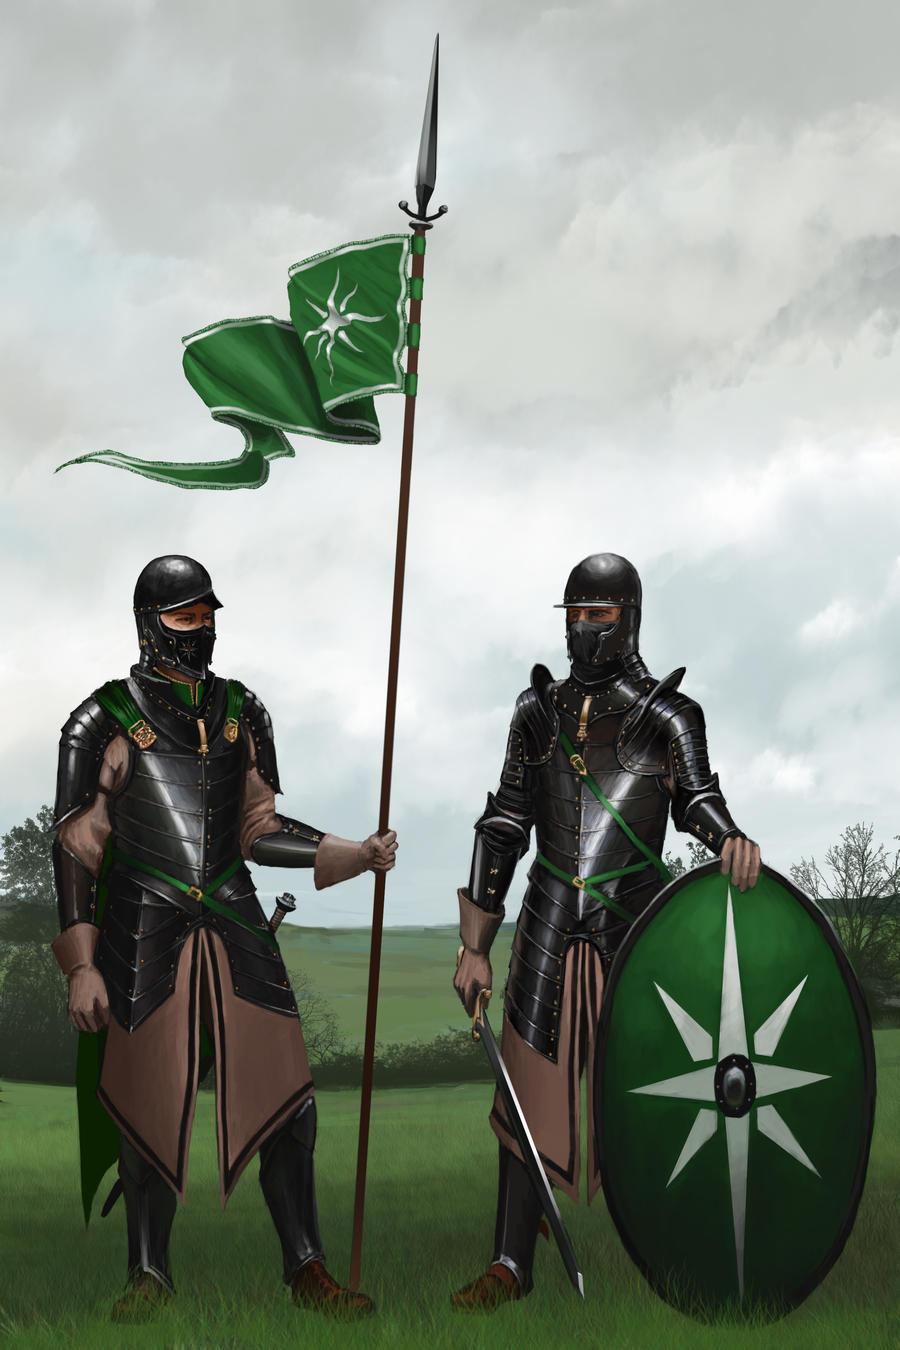 Utarian Dismounted Lancer and Swordsman of Foot by RobbieMcSweeney